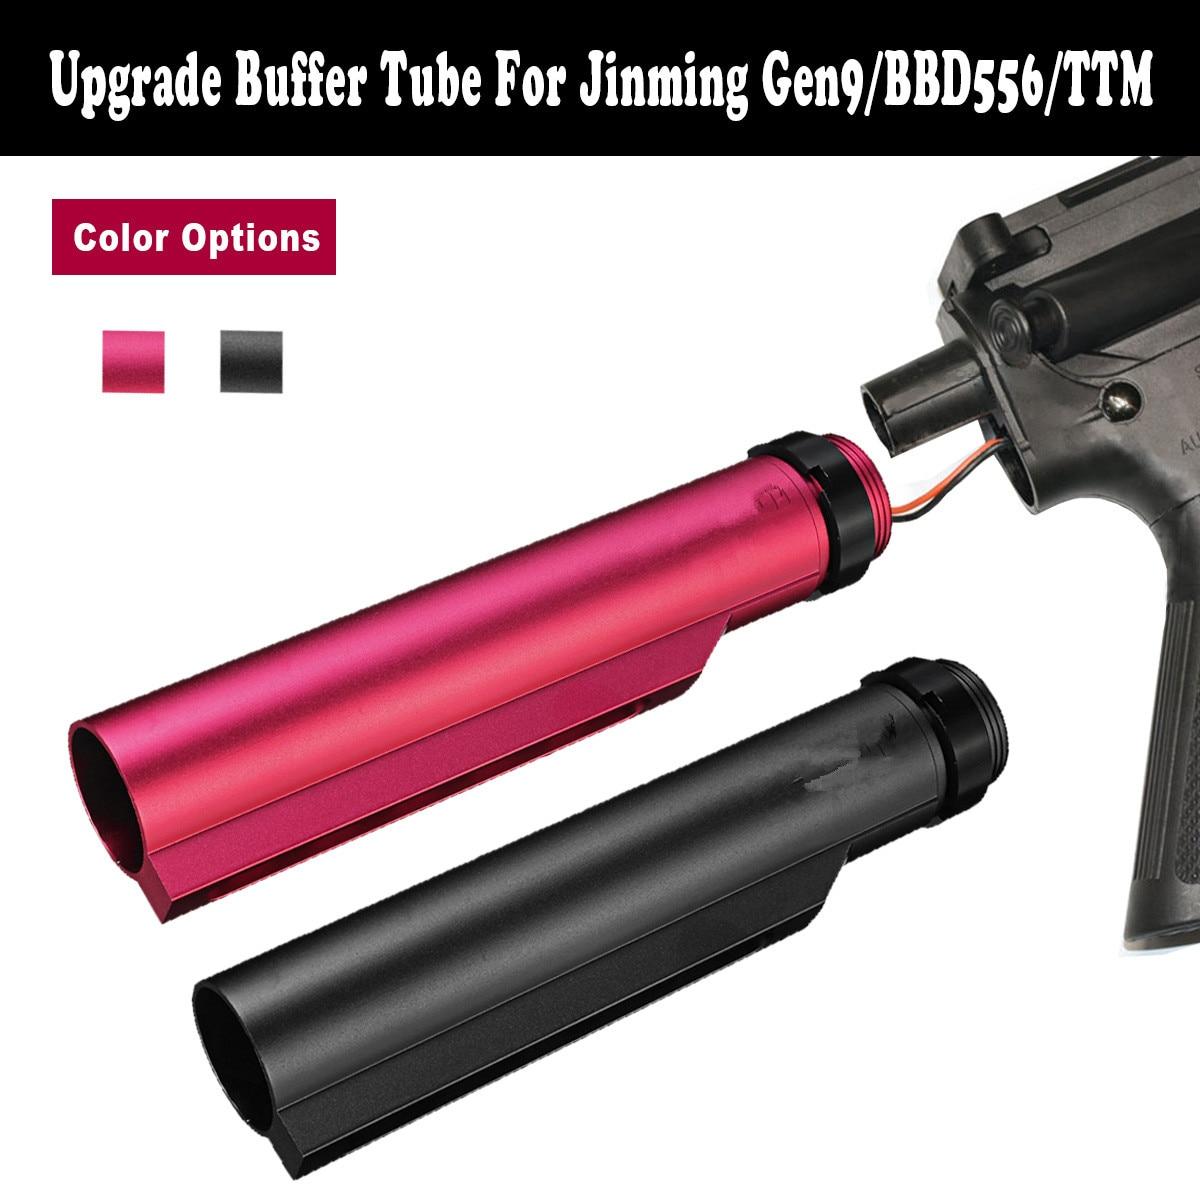 Upgrade Metal Buffer Tube for Jinming Gen9/BBD556/TTM Water Gel Ball Blasters Toy Guns Replacement Accessories 1